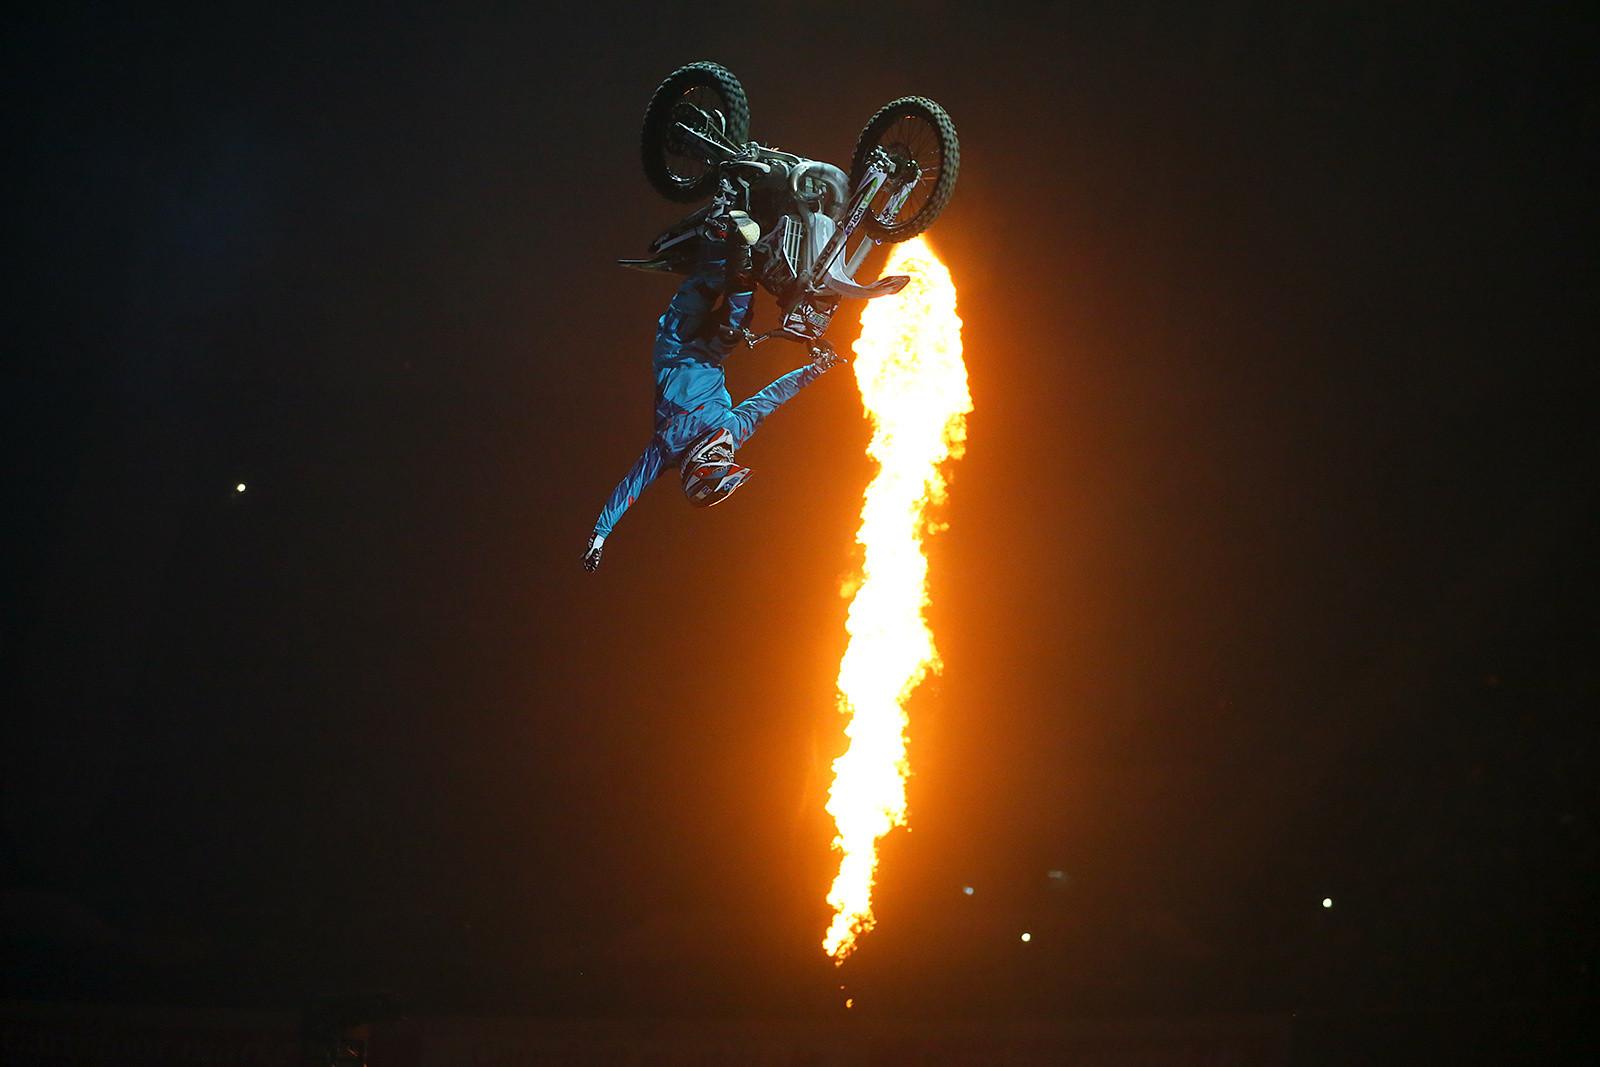 Brice Izzo - Photo Gallery: Paris-Lille Supercross, Day 2 - Motocross Pictures - Vital MX